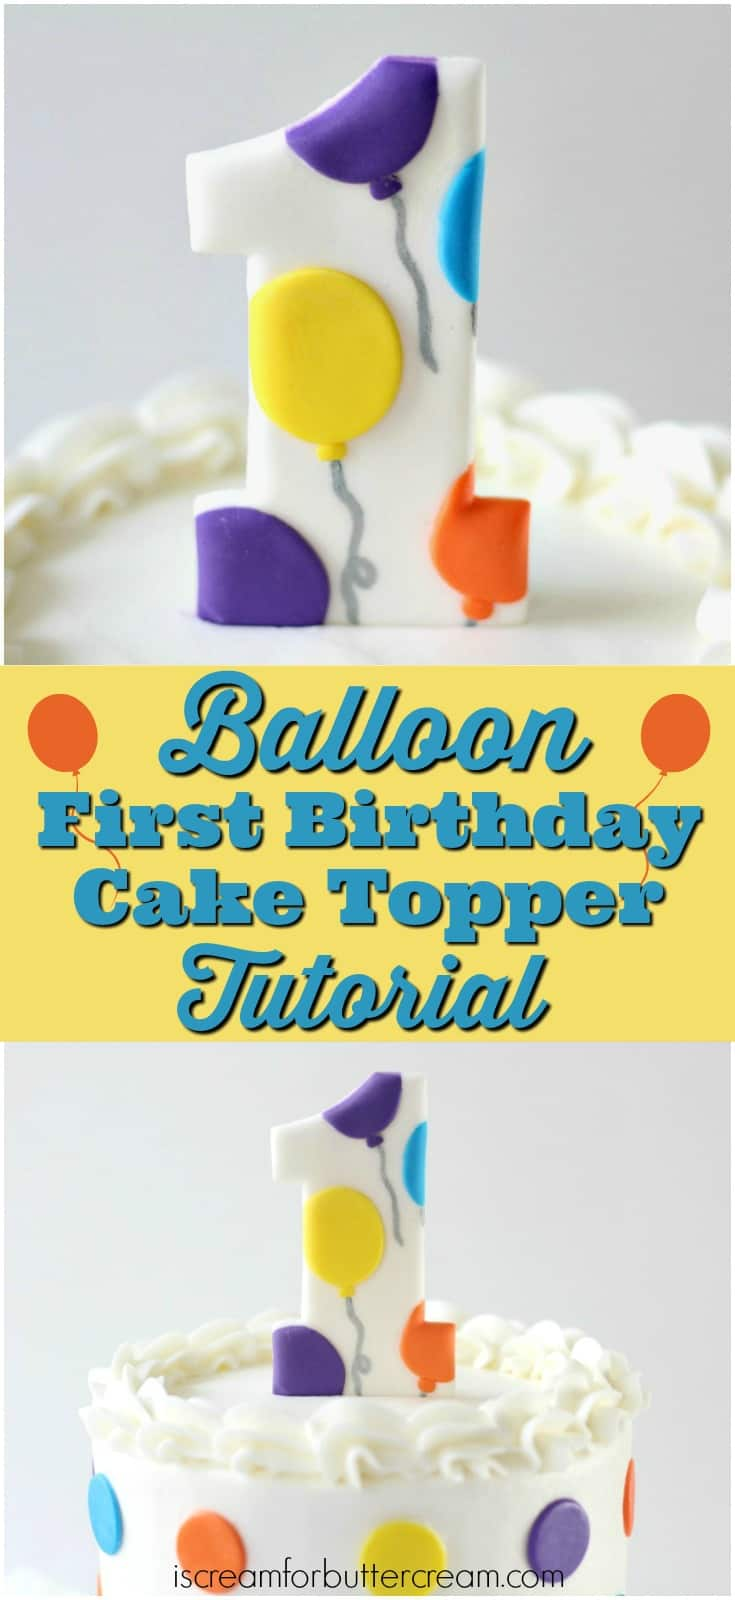 3 DIY First Birthday Cake Toppers for Boys I Scream for Buttercream